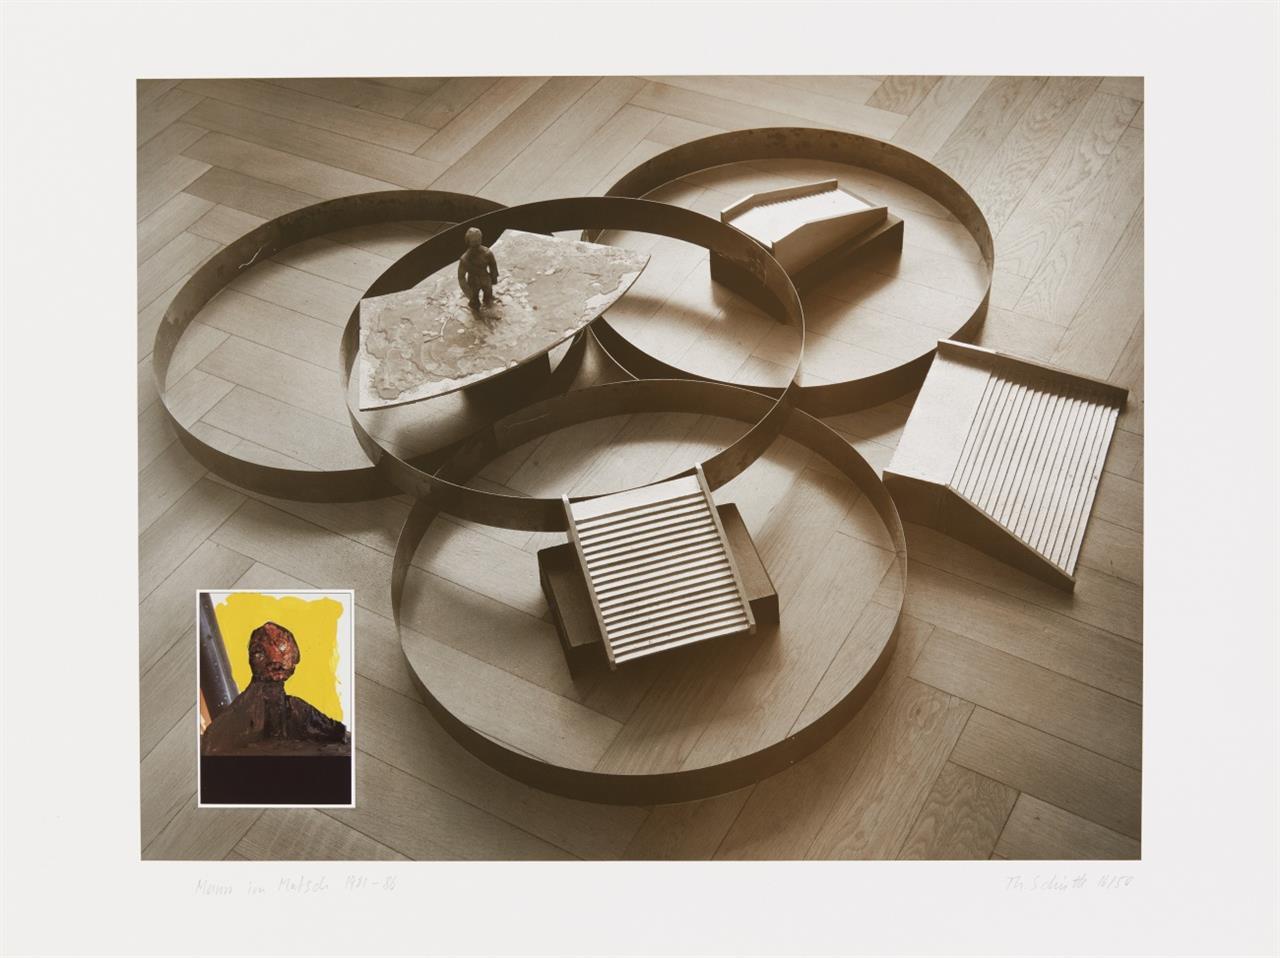 Mappenwerke/Sammlungen. 5 Bildhauer als Grafiker. 1986. 5 Graphiken, jeweils signiert. Ex. 16/50. Edition Kunstring Folkwang Essen. (Katharina Fritsch, Hubert Kiecol u.a.)